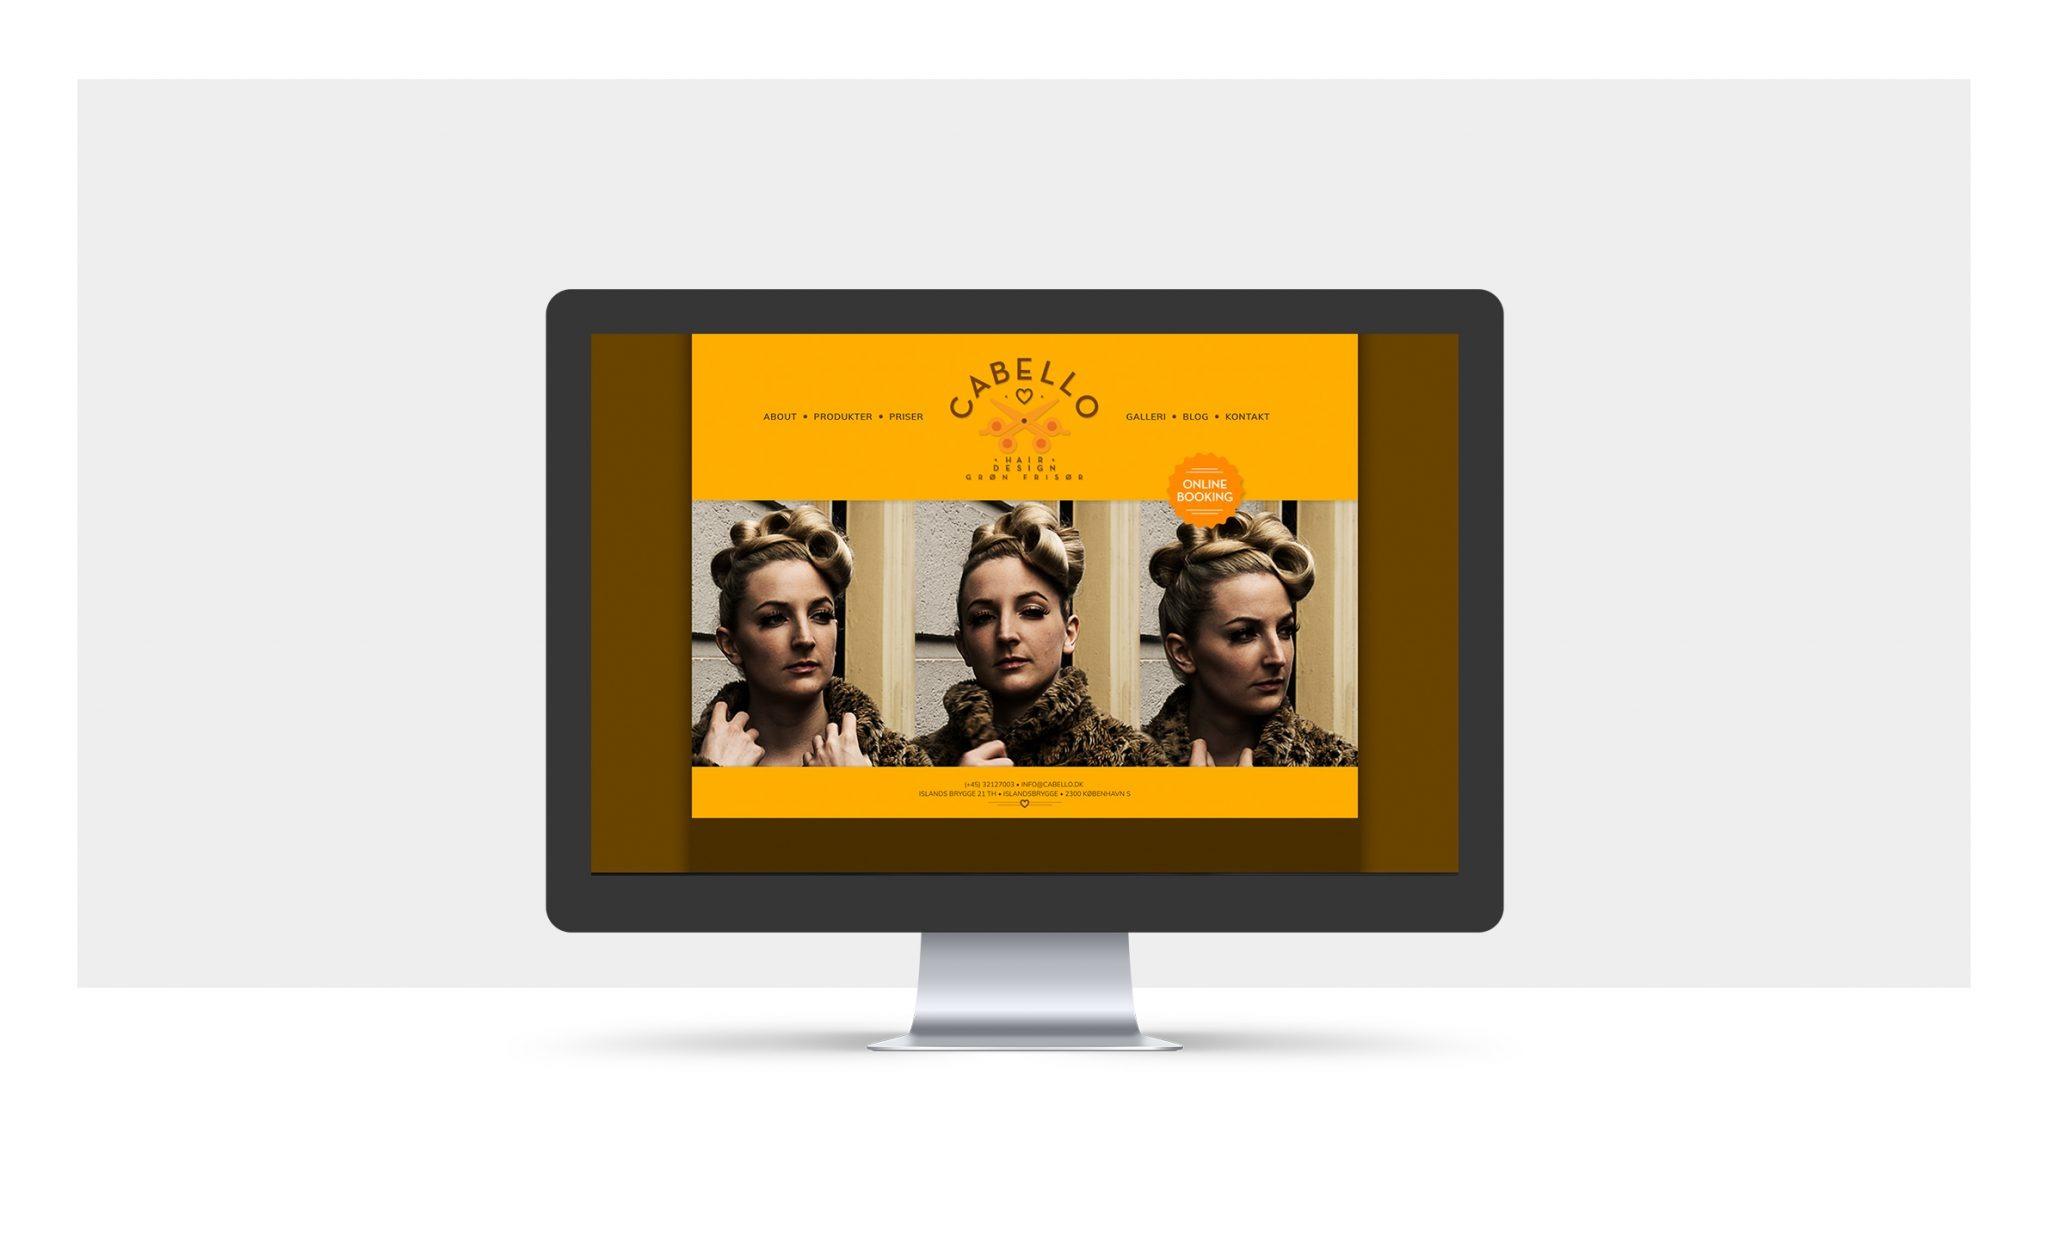 cabello-web-cover.jpg